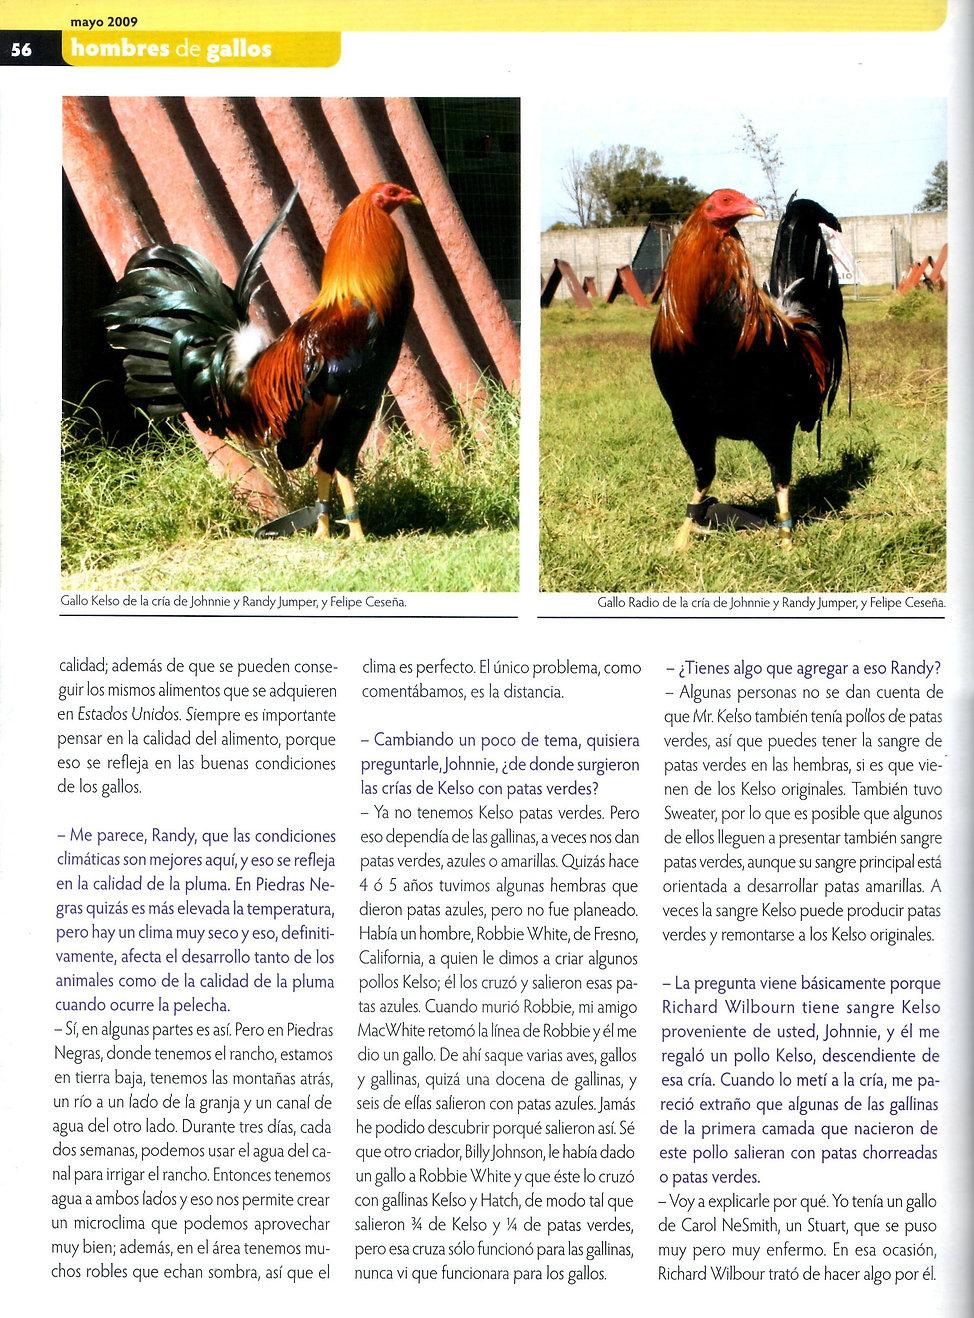 entrevista de gallos pie de cria a potre